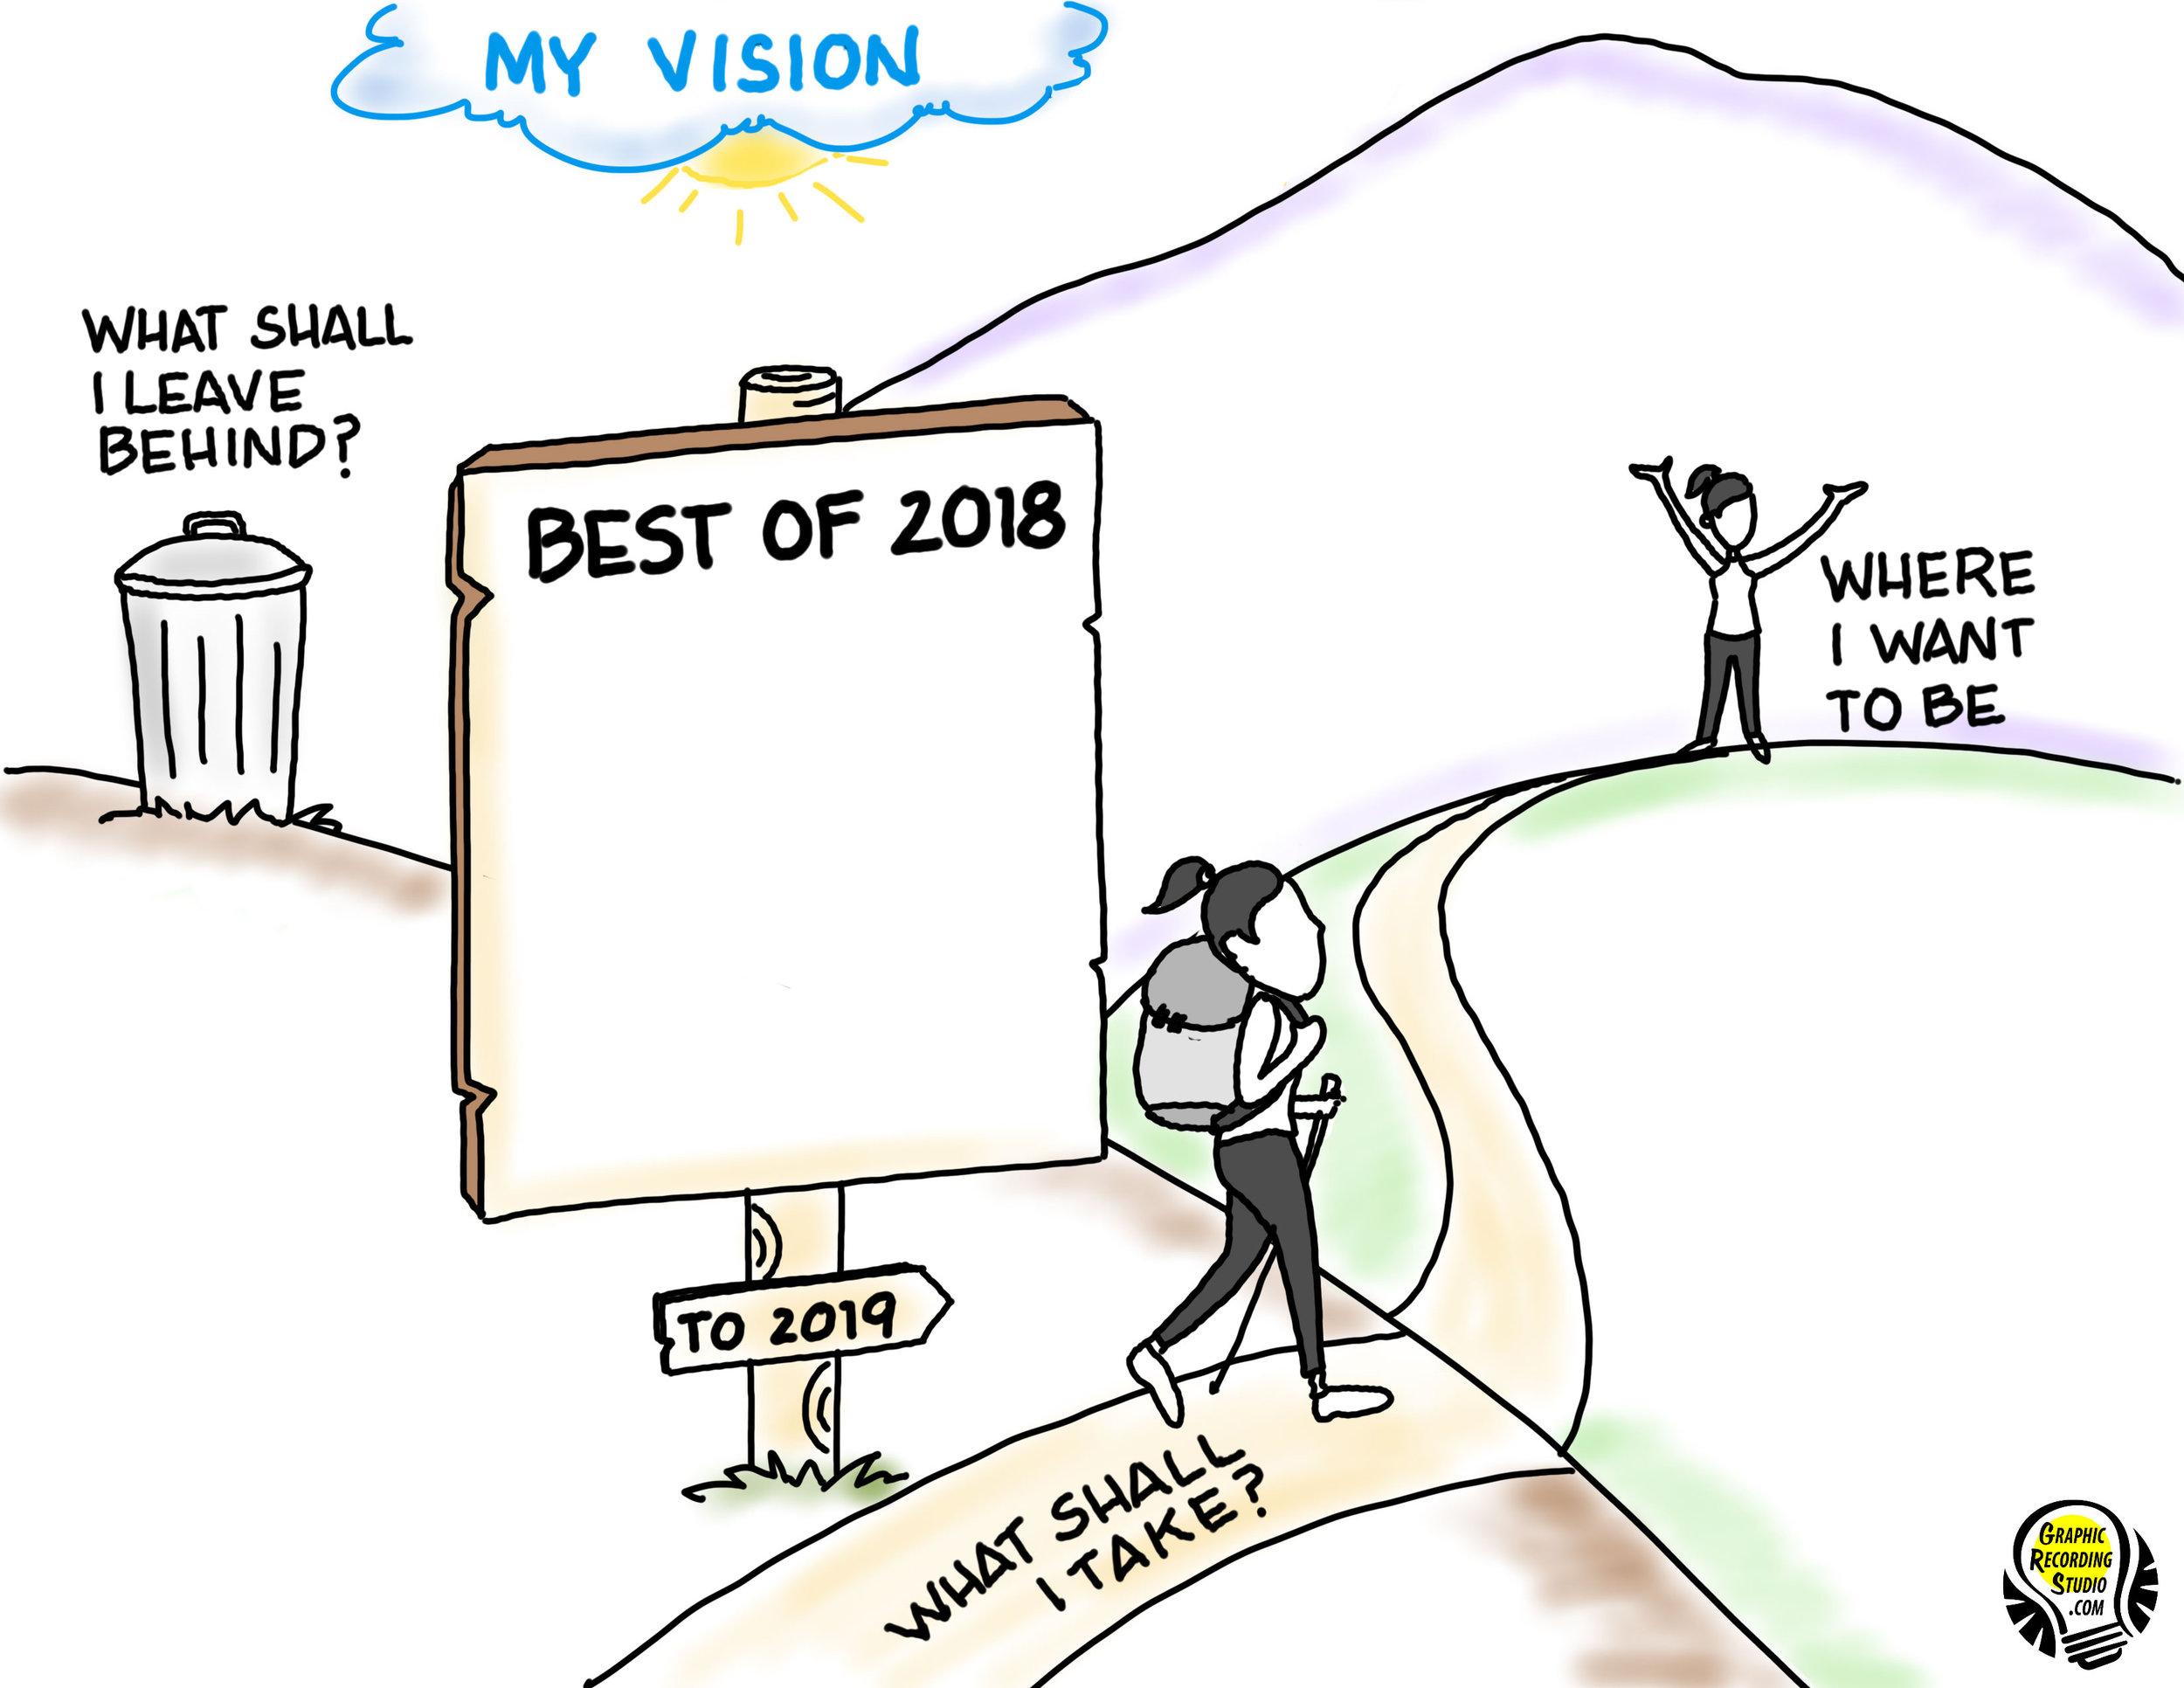 vision-2019graphicrecordingstudio.jpg